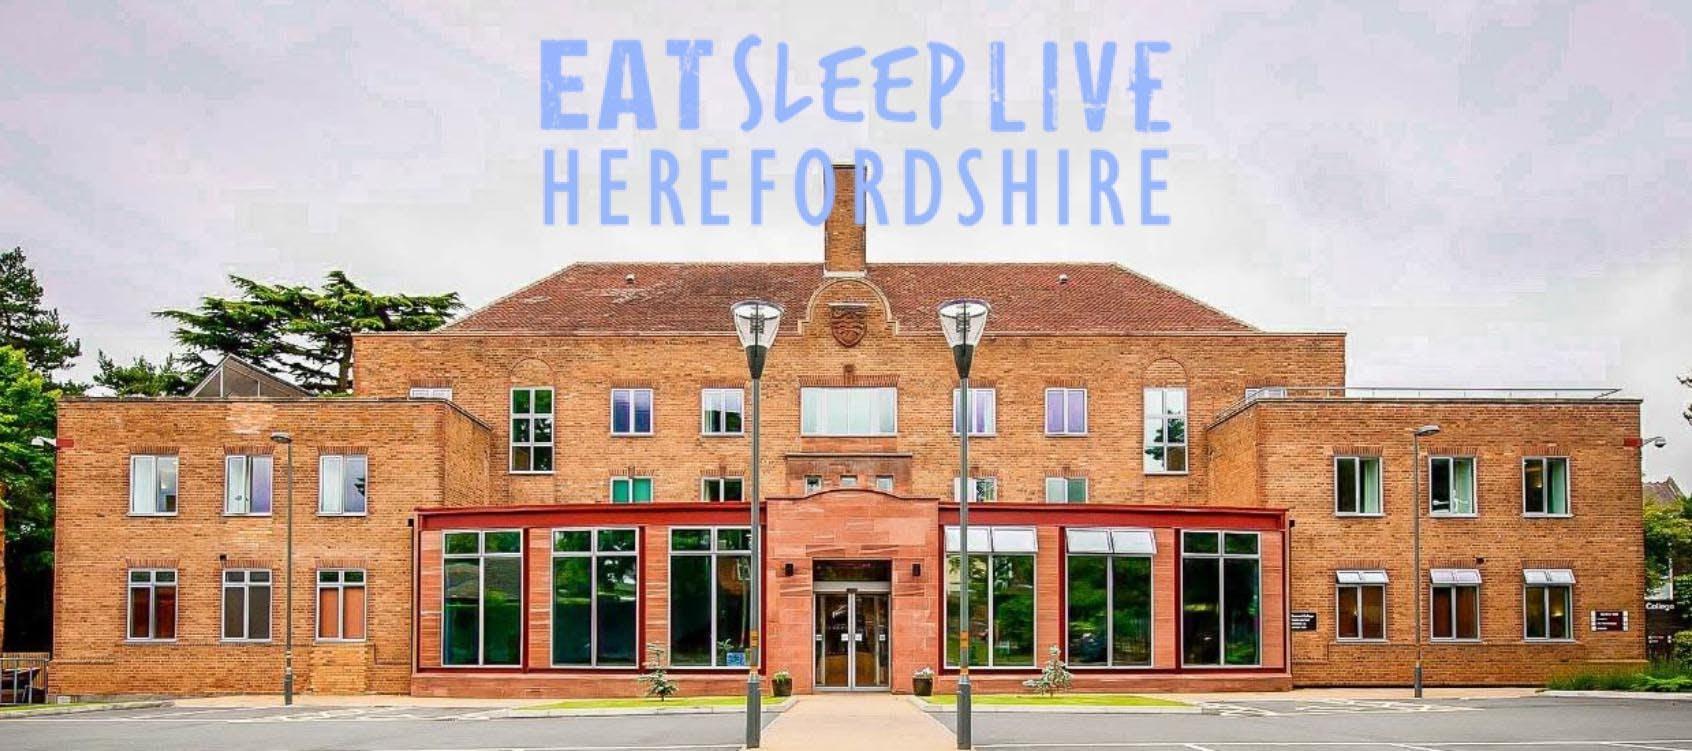 Herefordshire Autumn 2018 Tourism Forum